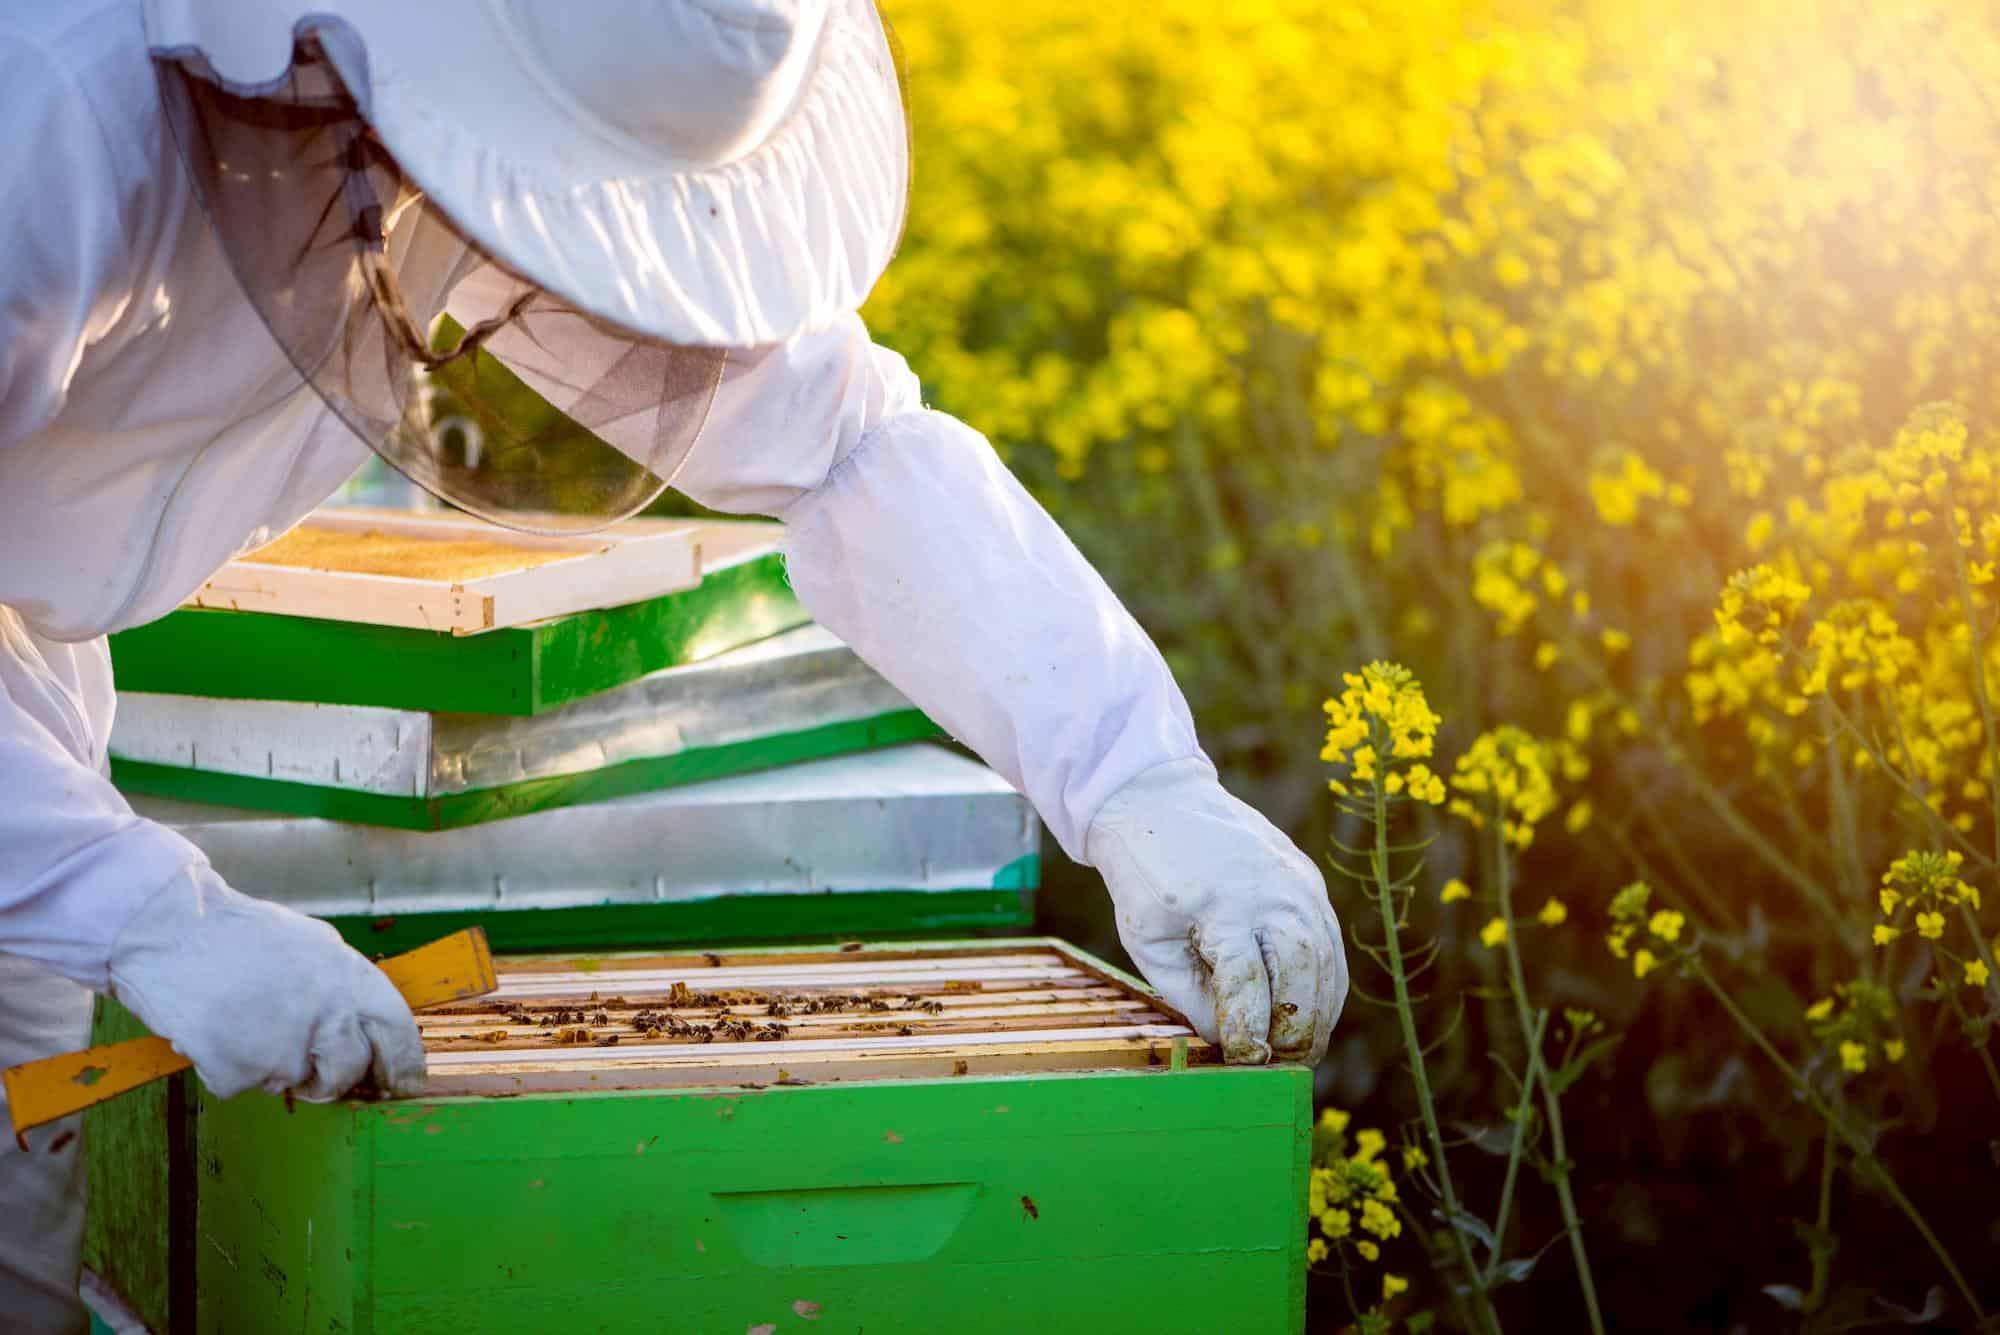 Beekeeper in a bee suit